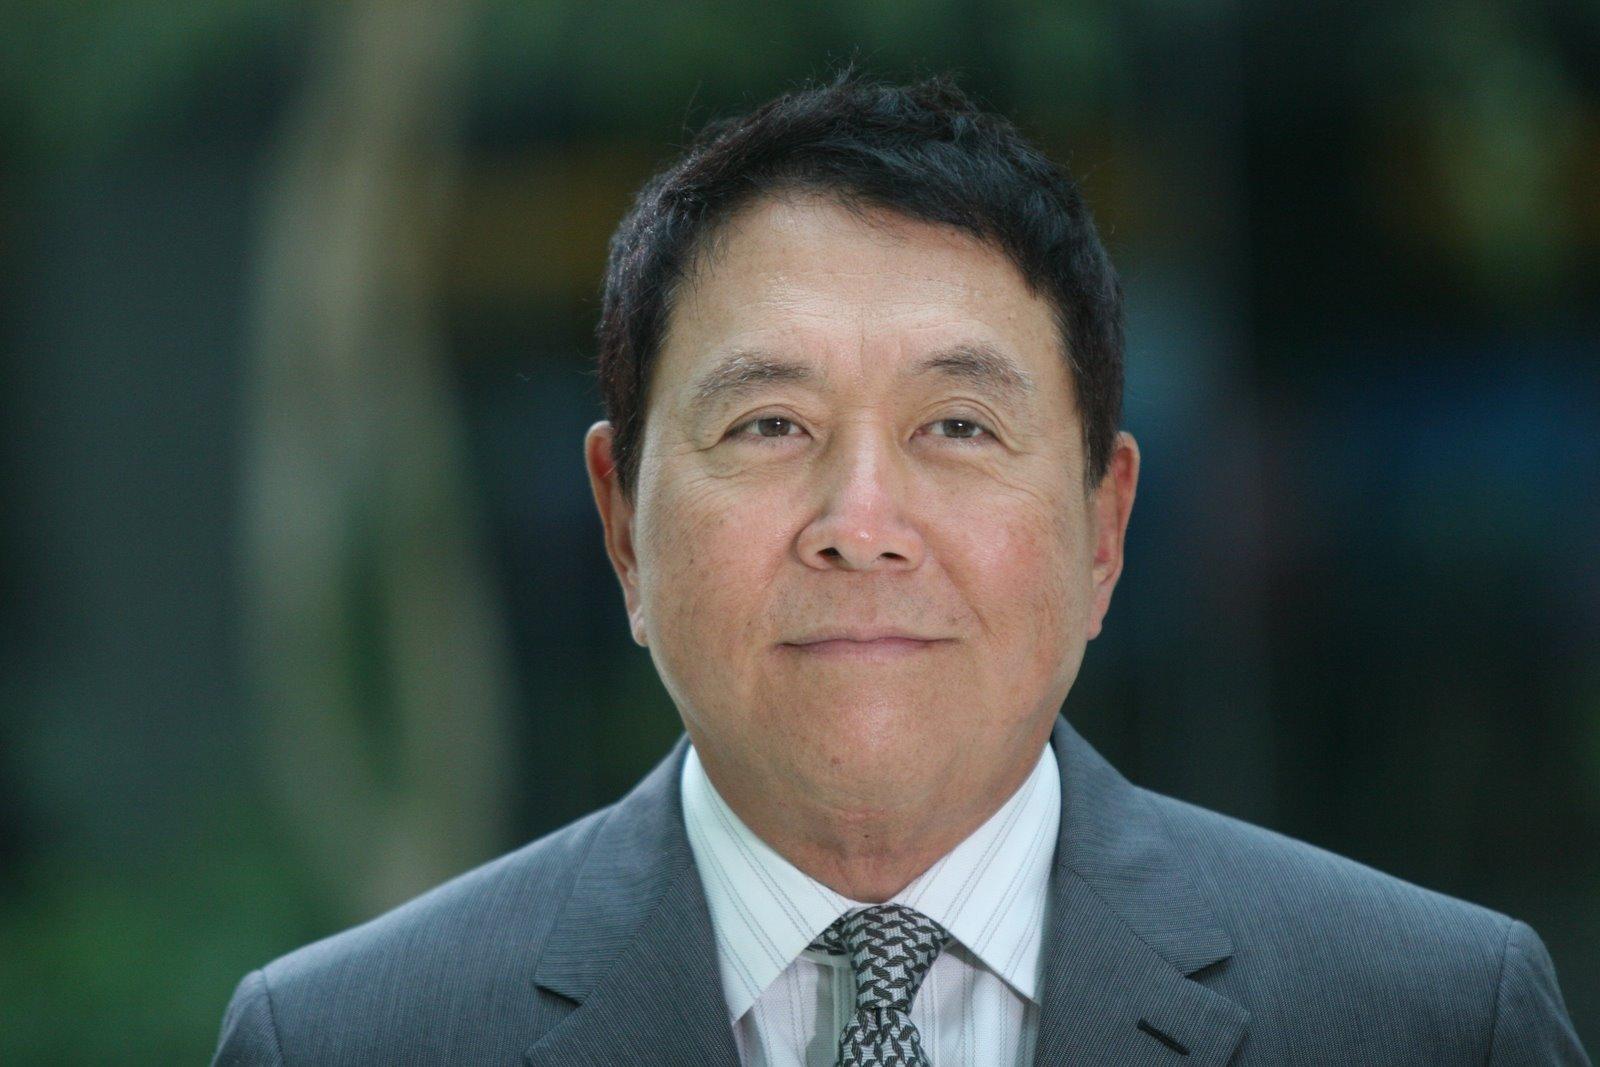 Robert-Kiyosaki-Net-Worth